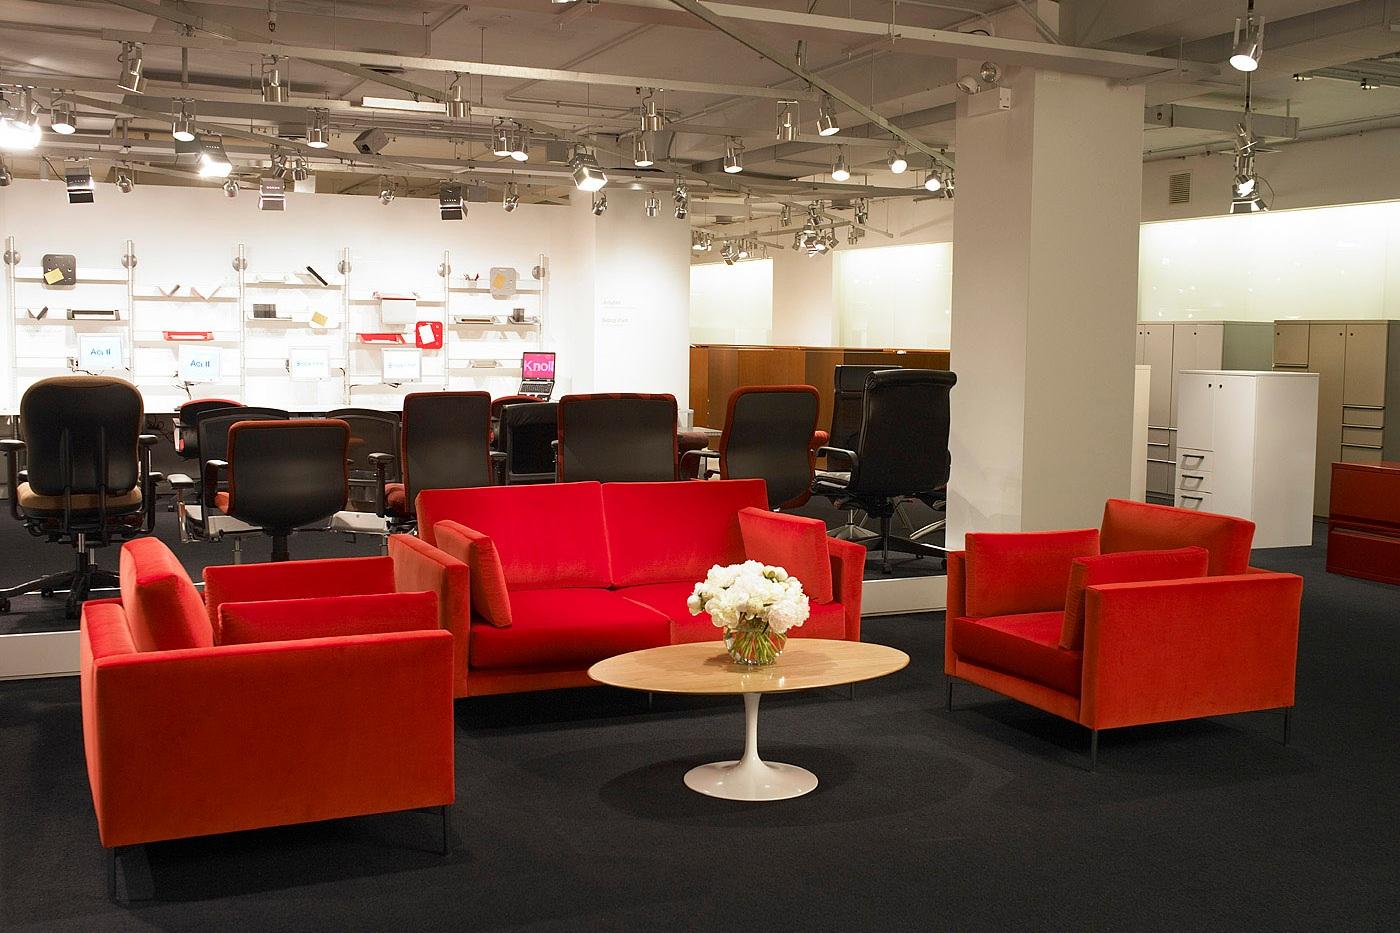 $$ - Divina Standard Lounge Chair